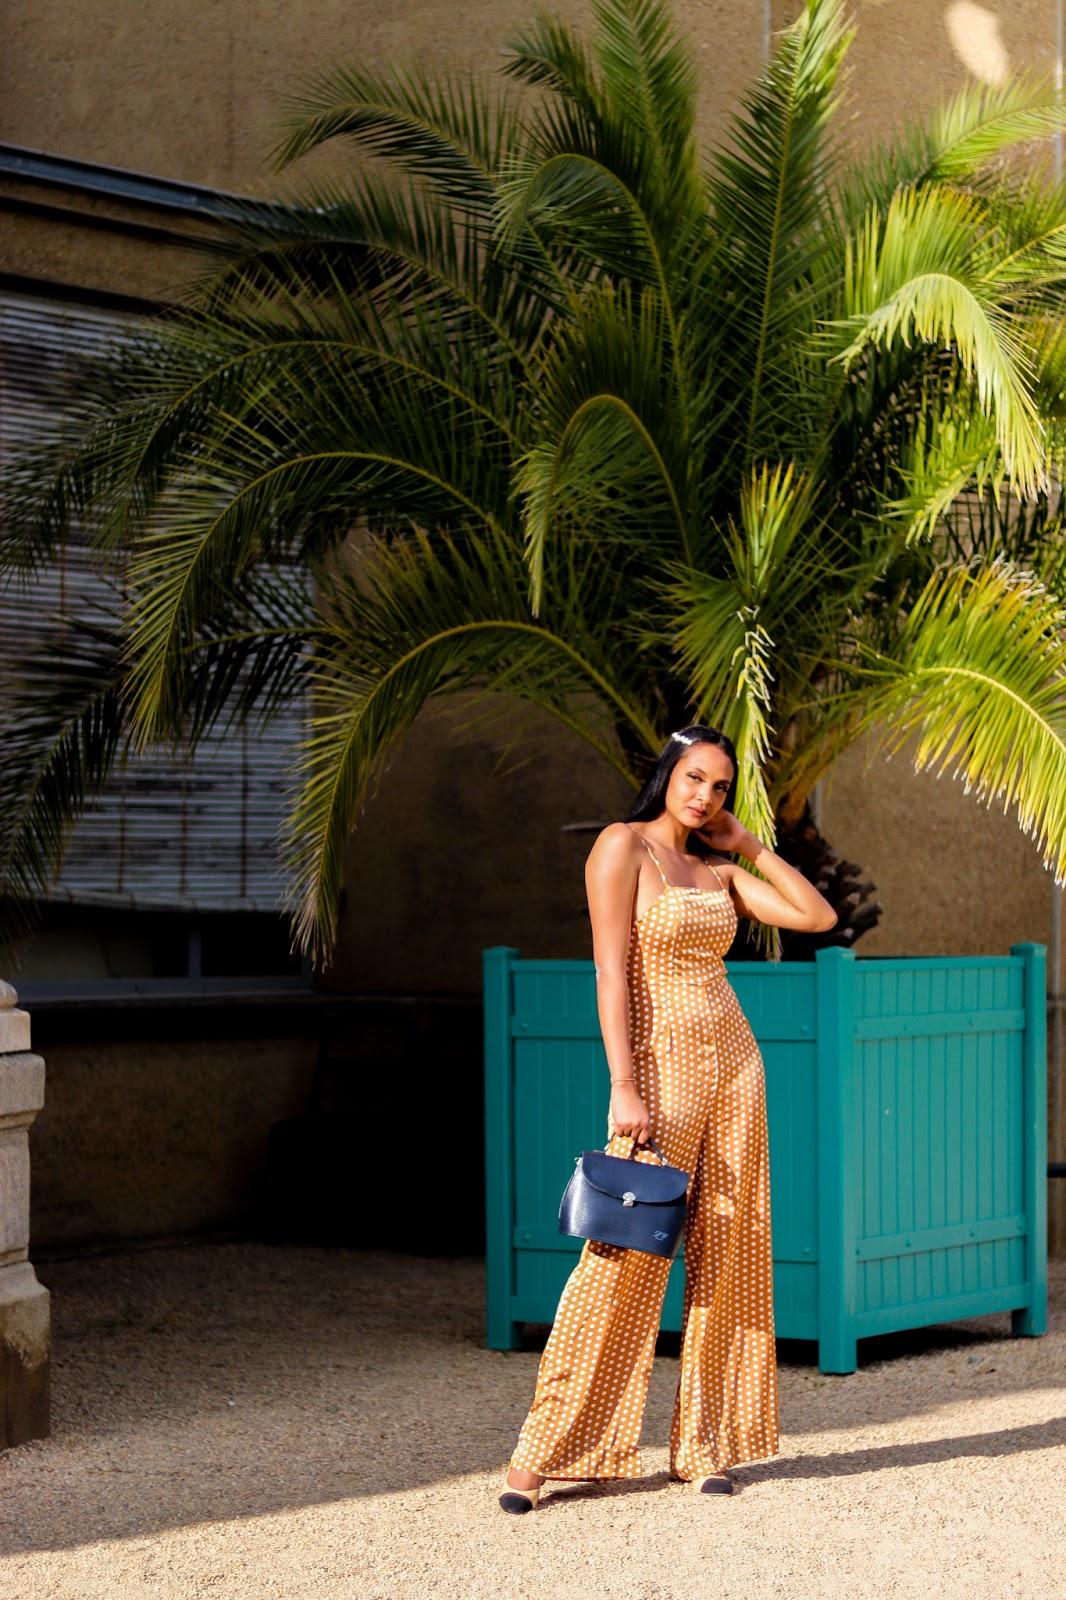 https://simplyzar.blogspot.com/2019/06/summer-spring-2019-fashion-trend-polka.html